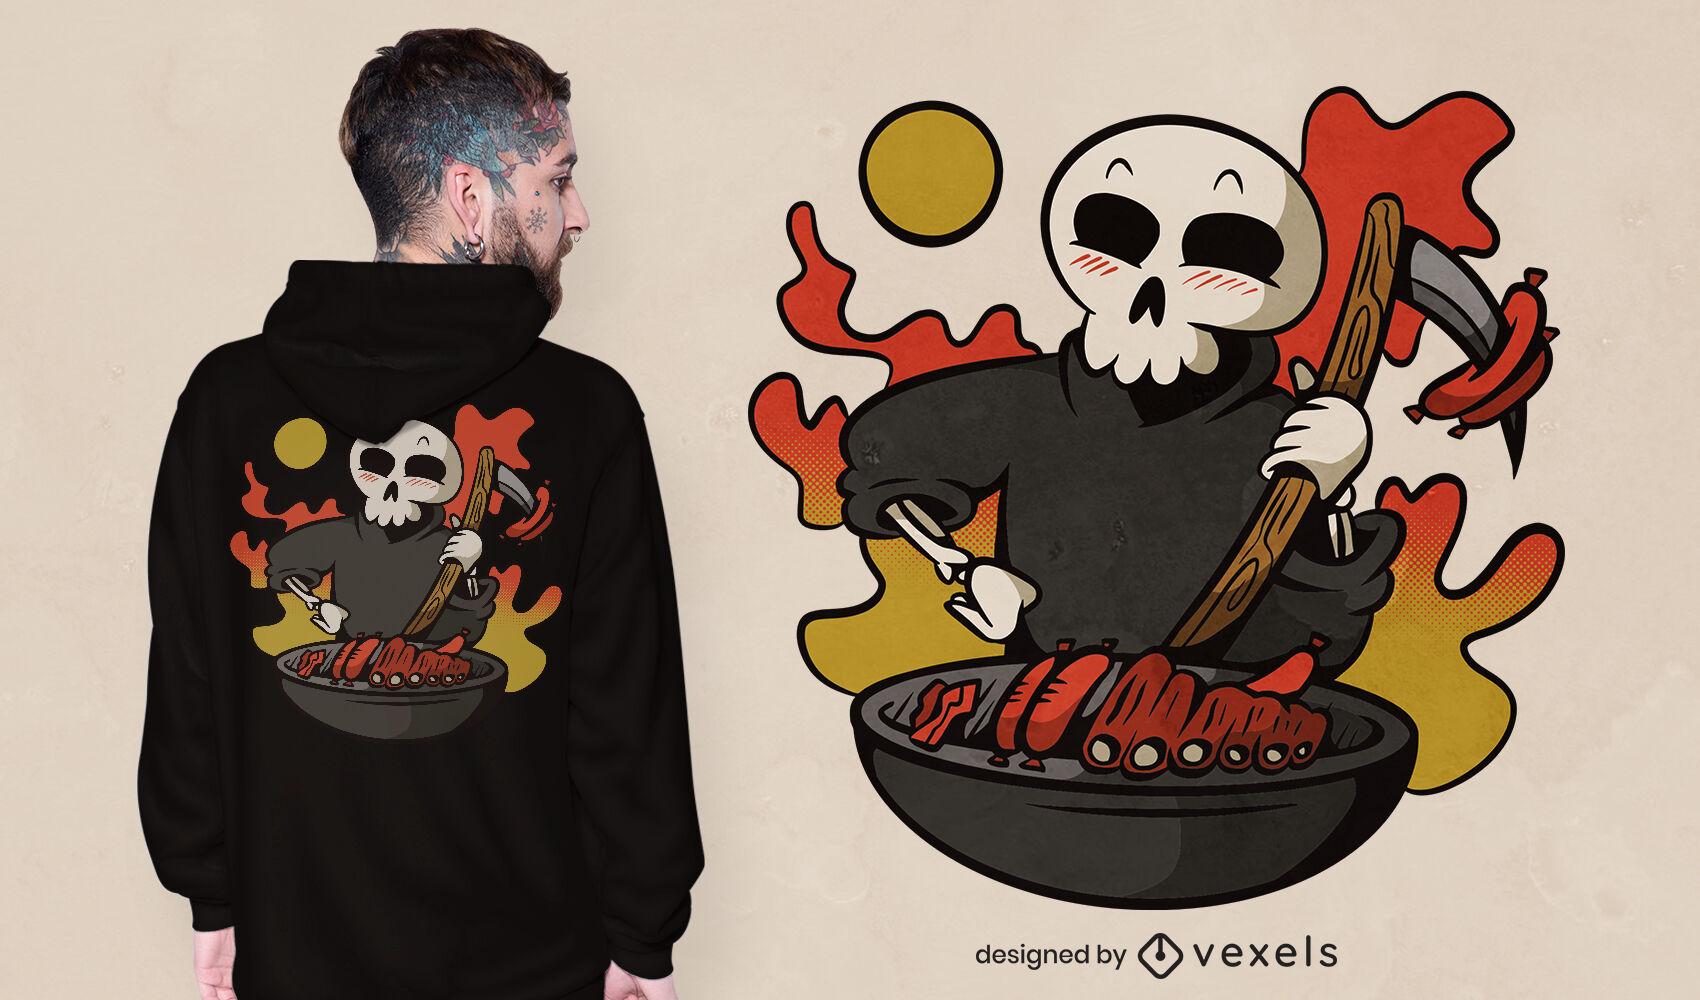 Grim reaper cooking grill t-shirt design